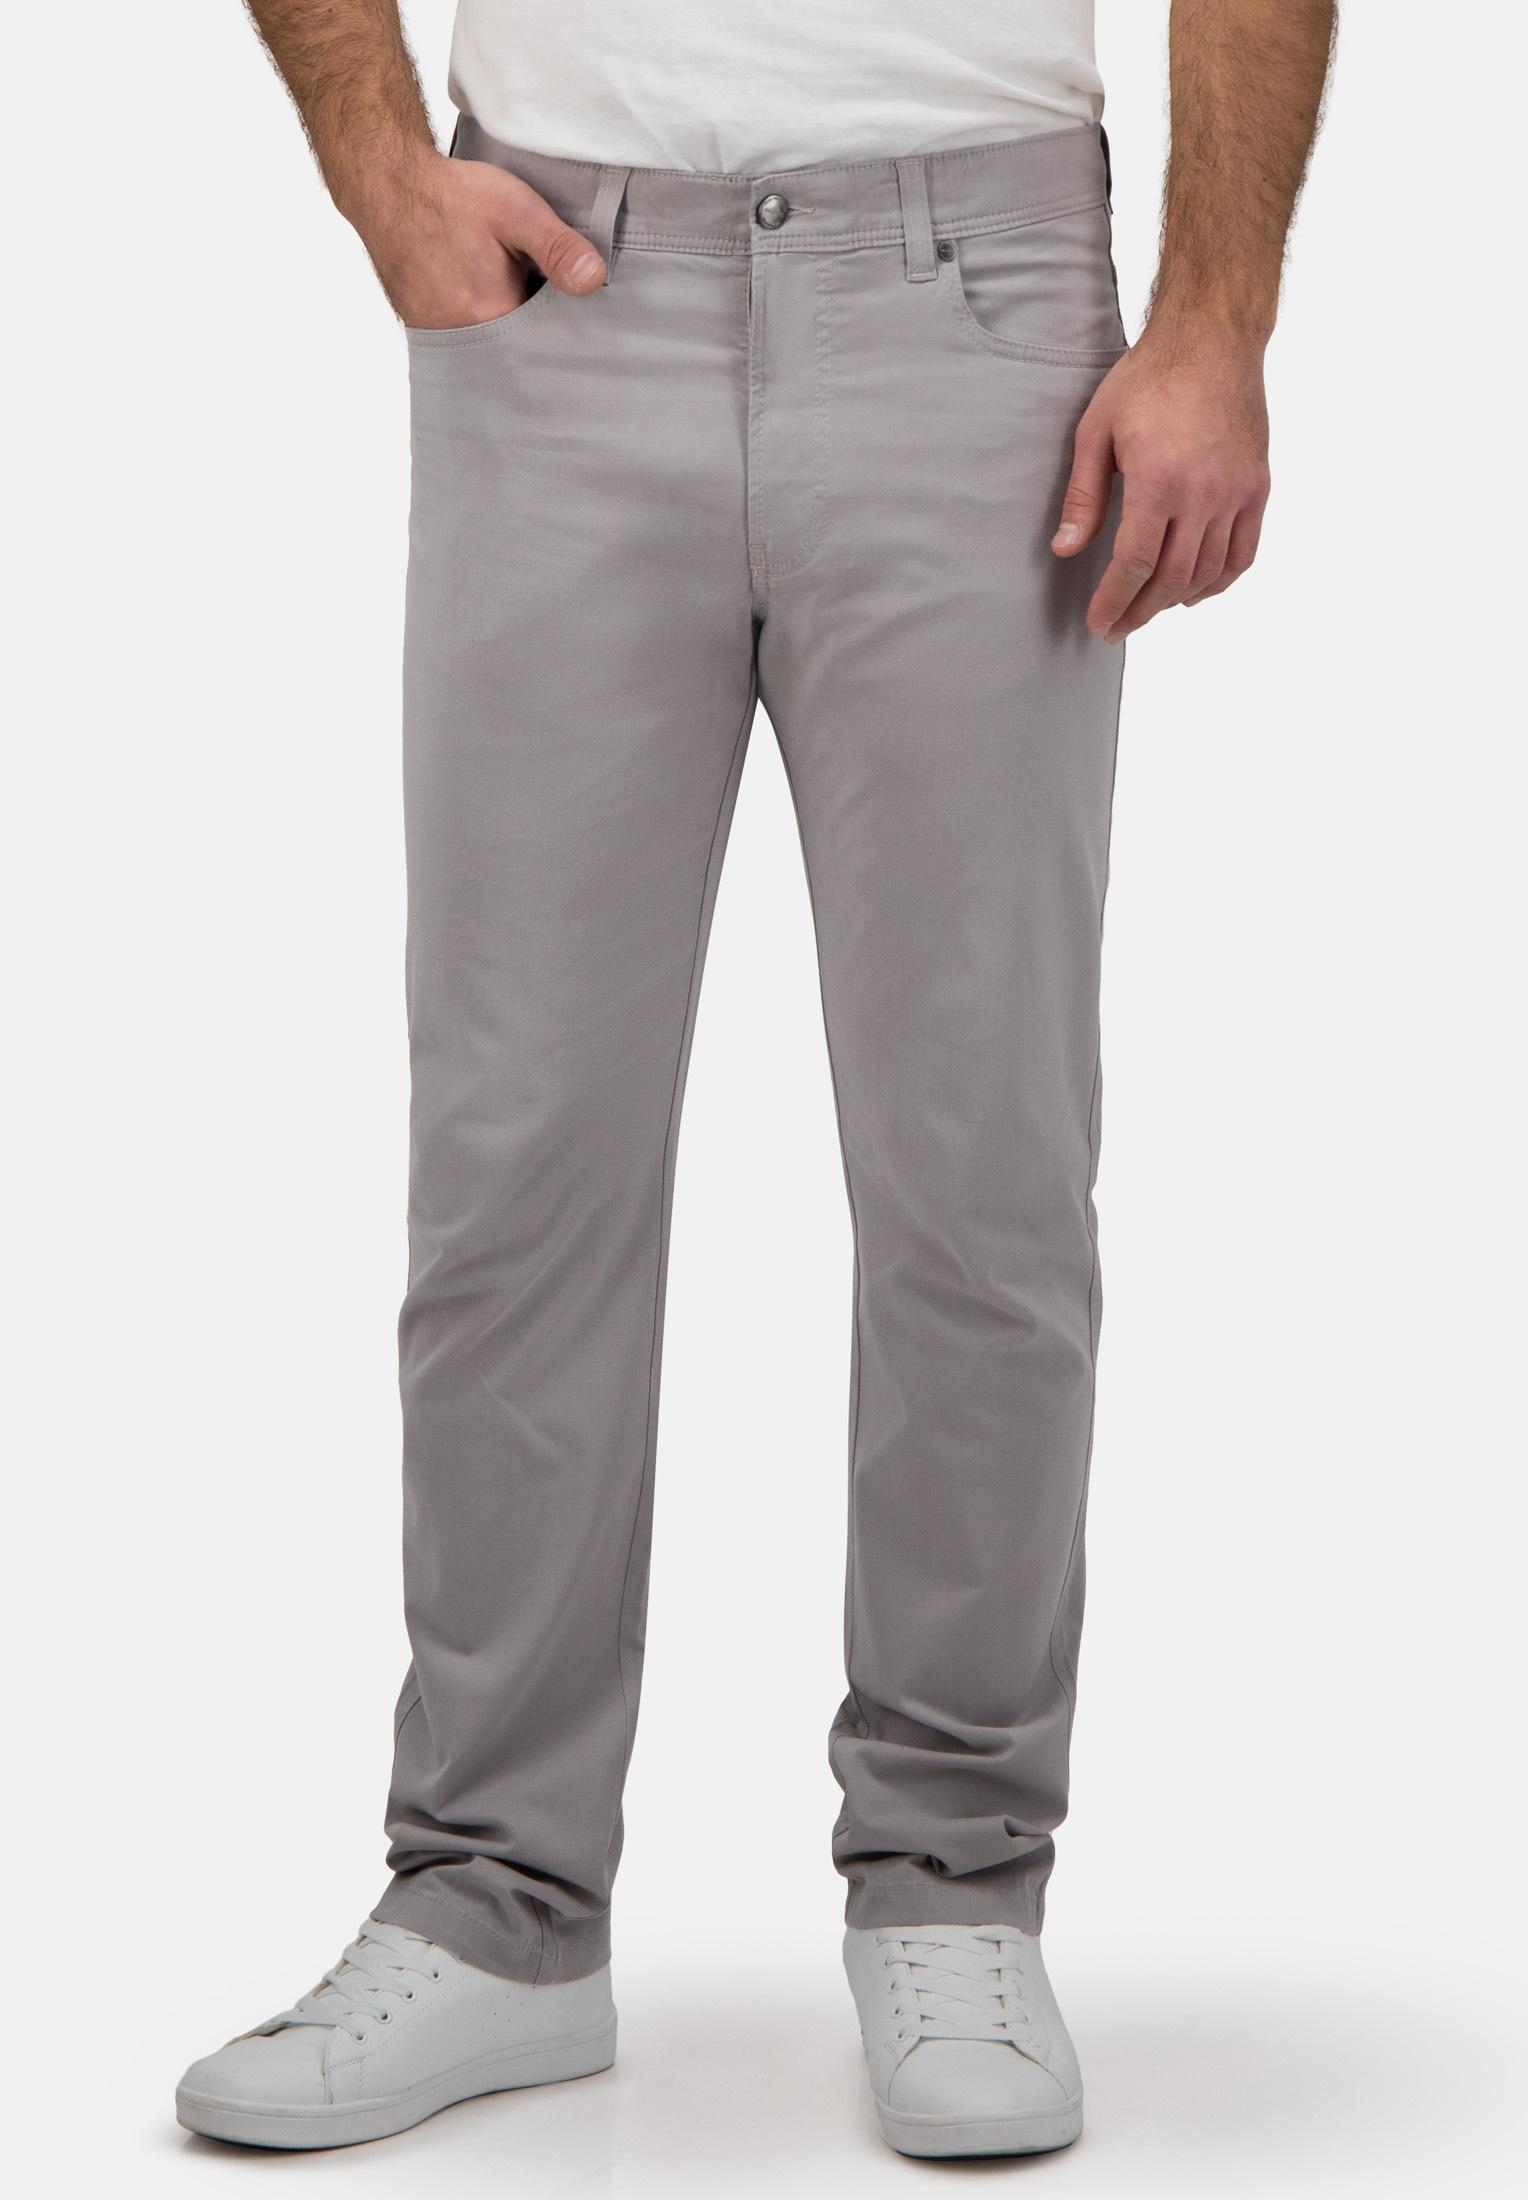 brühl -  5-Pocket-Jeans Genua III, in Baumwoll-Stretch Qualität